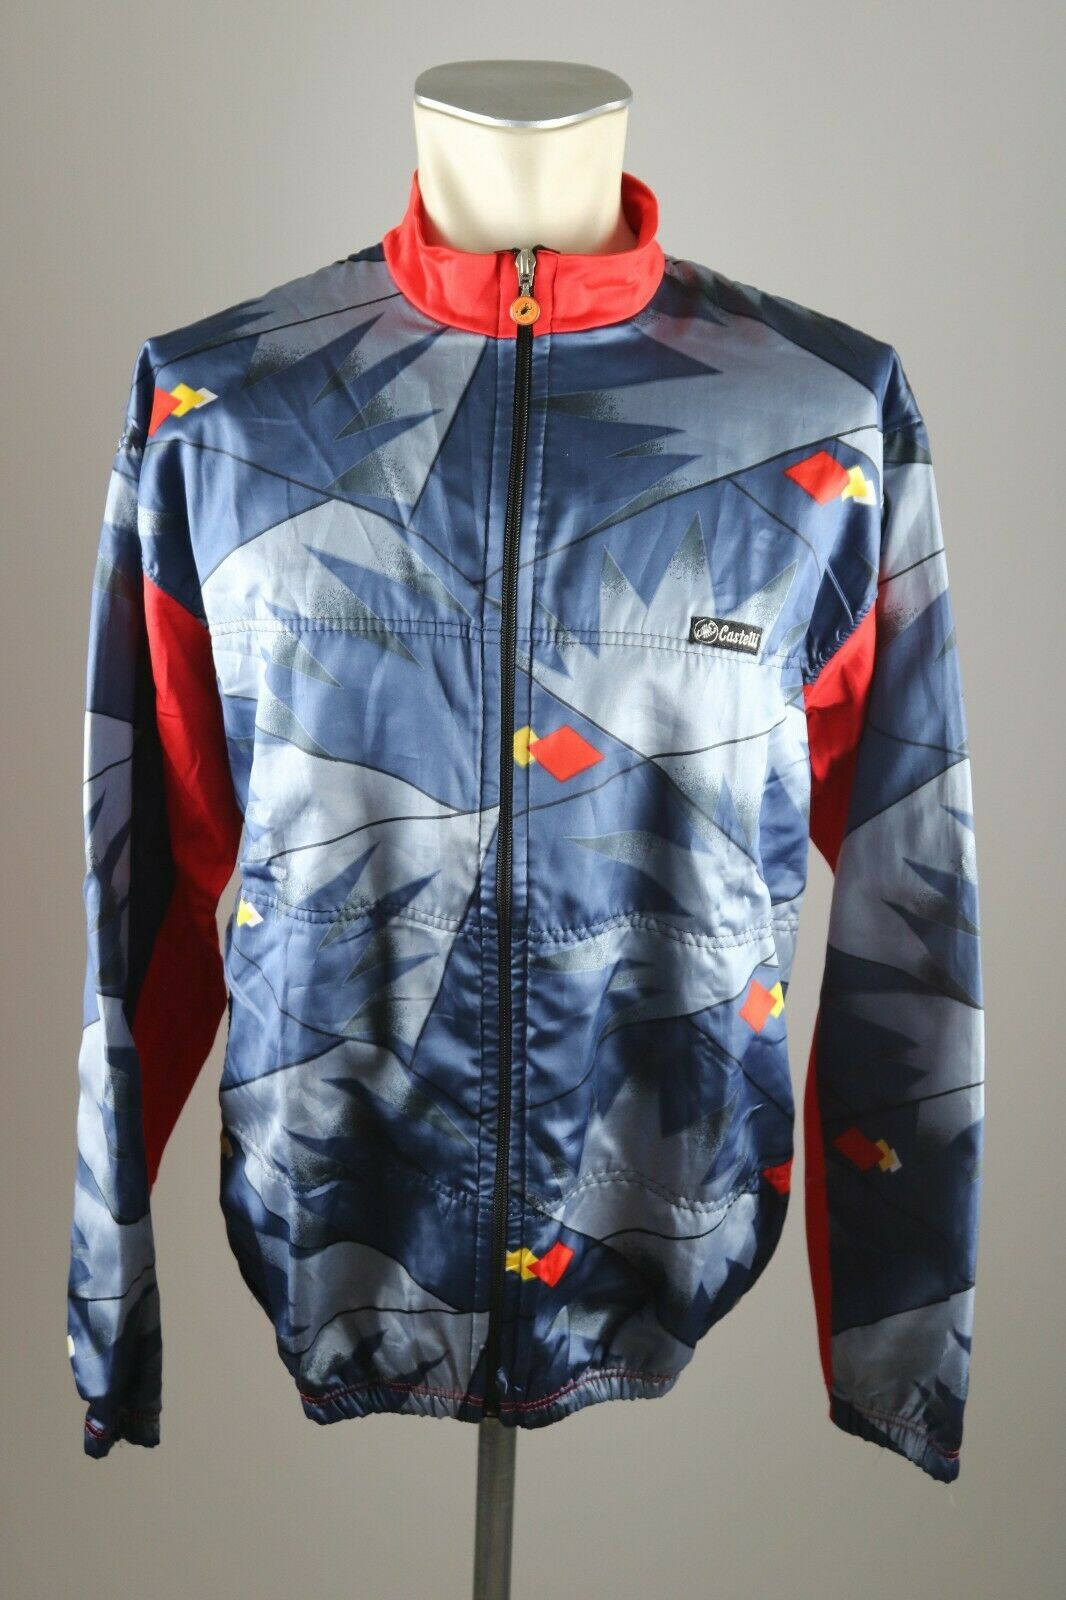 Castelli vintage 80s 80er rueda  chaqueta talla 5 V BW 57cm bike Cycling  Entrega gratuita y rápida disponible.